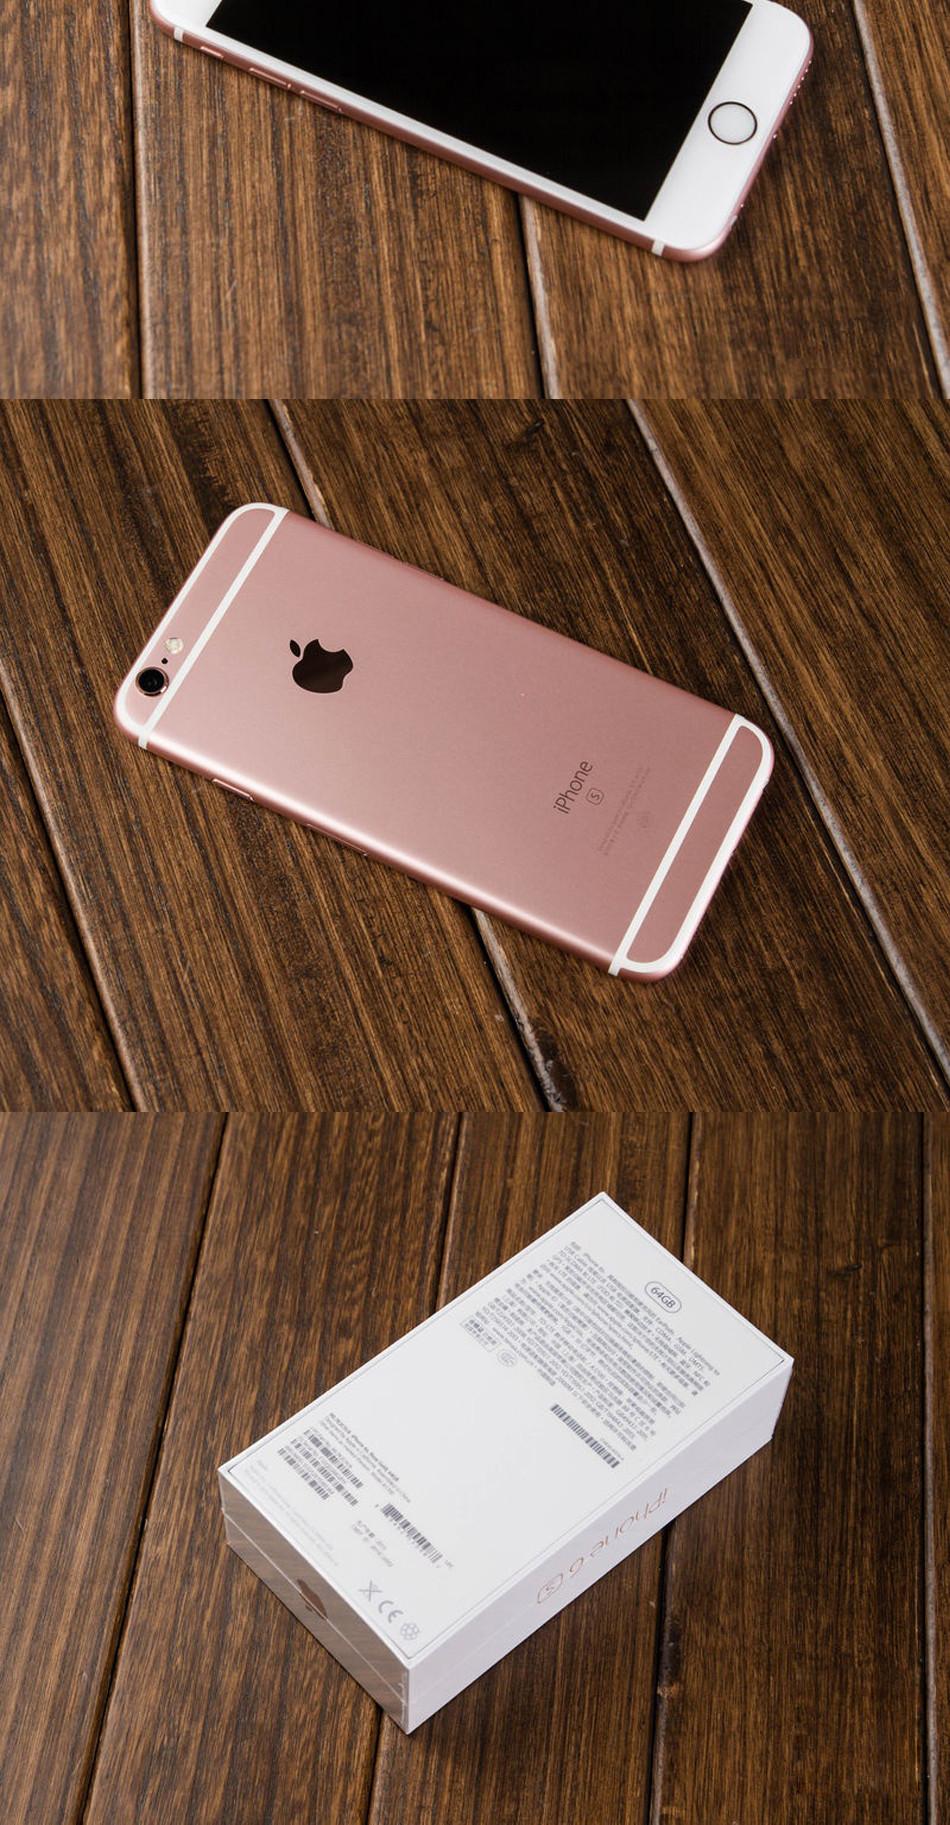 iPhone-6s_16